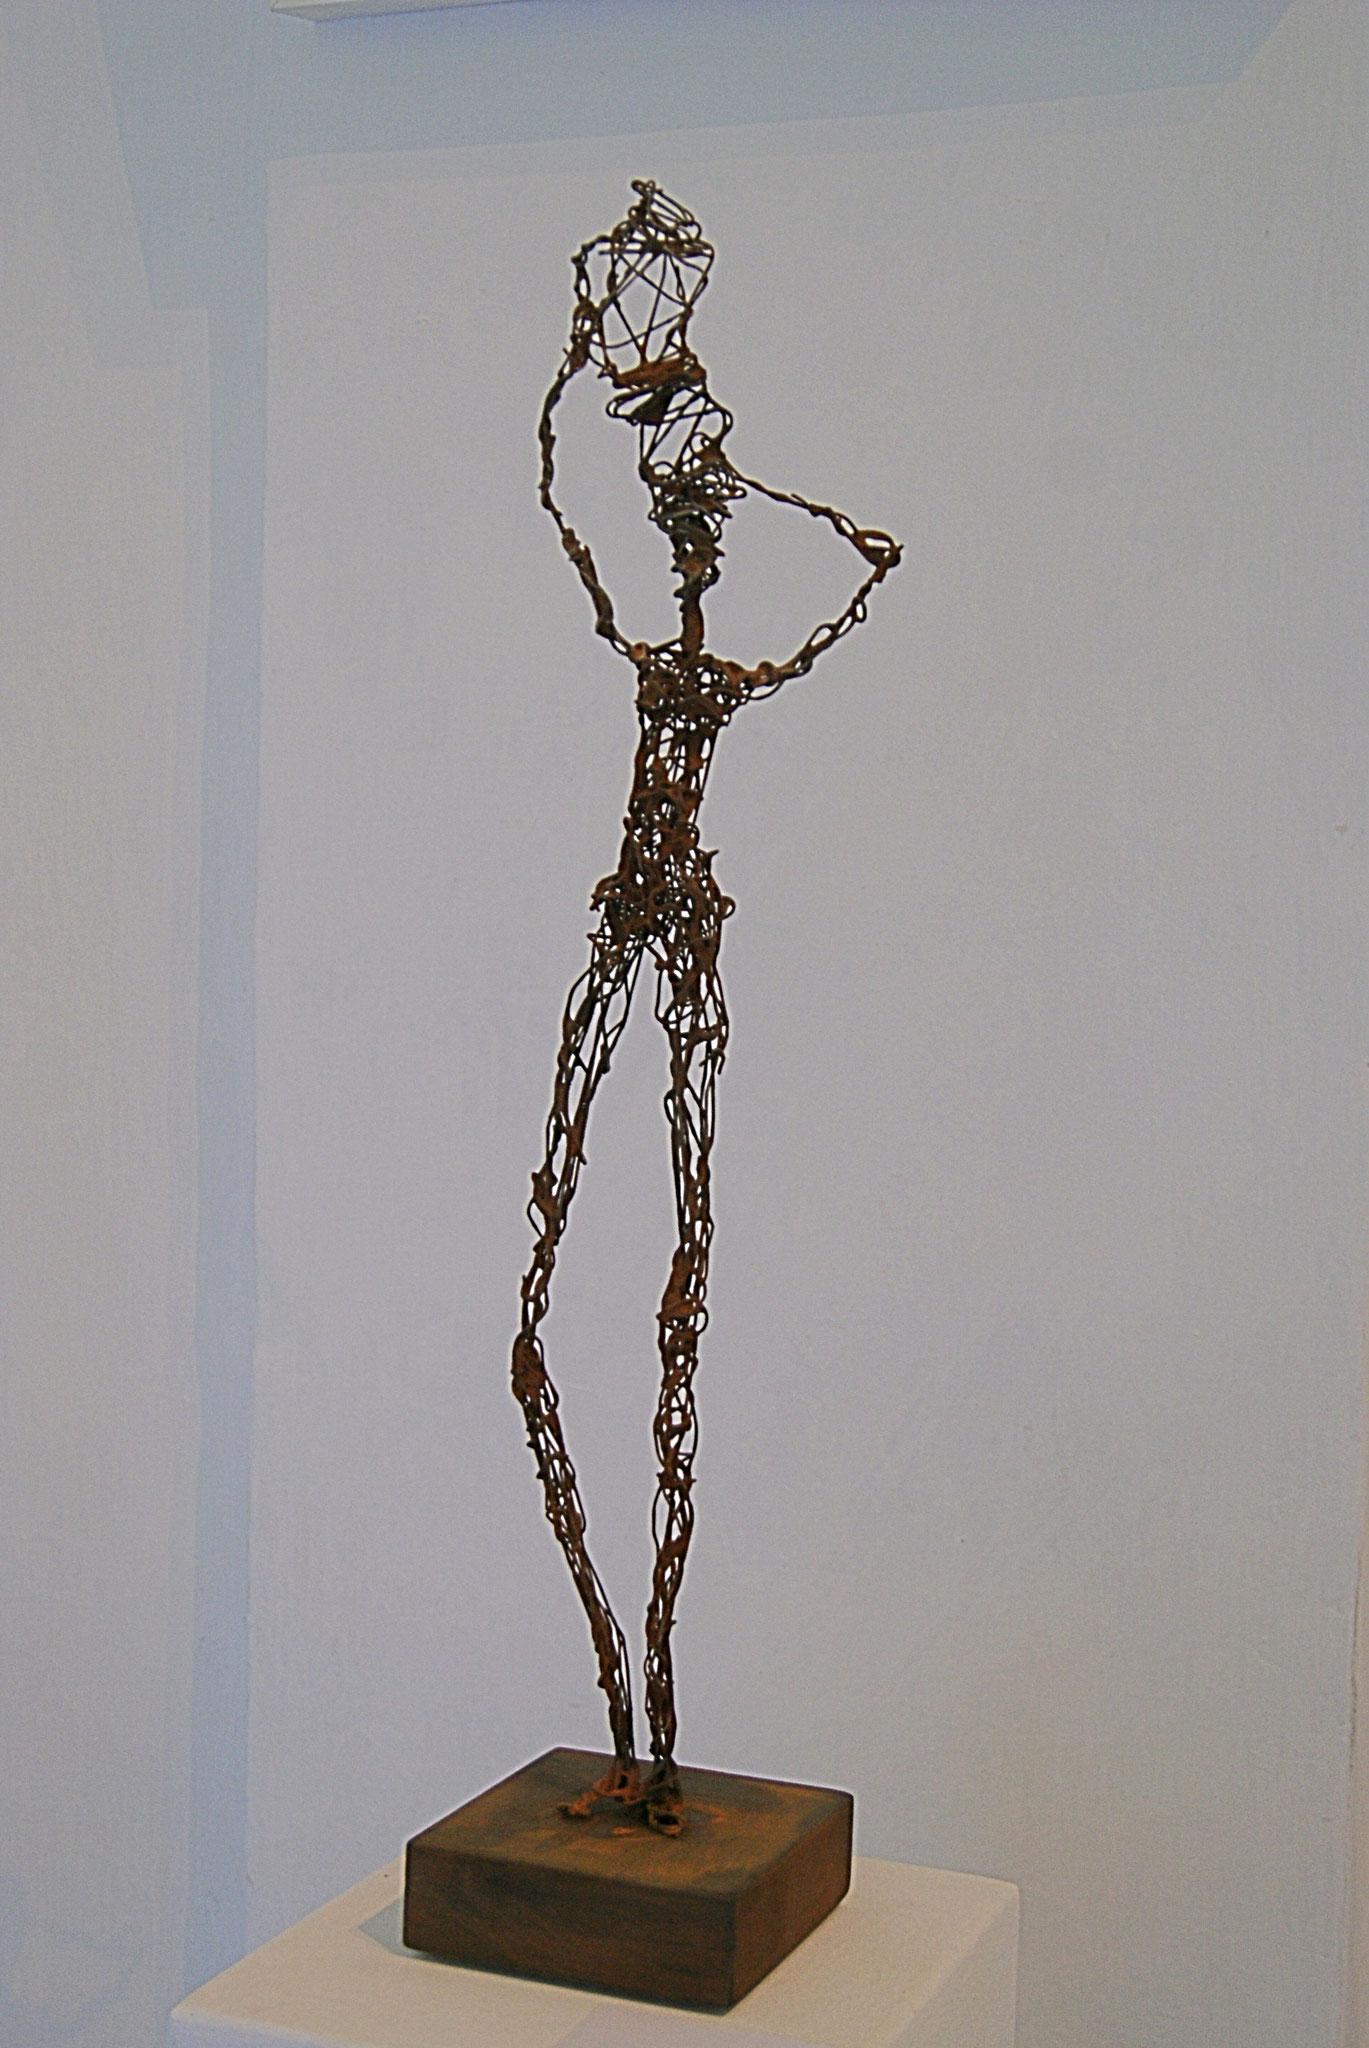 Drahtskulpturen Und Drahtbilder Anja Vogt Drahtskulpturenvogts Webseite